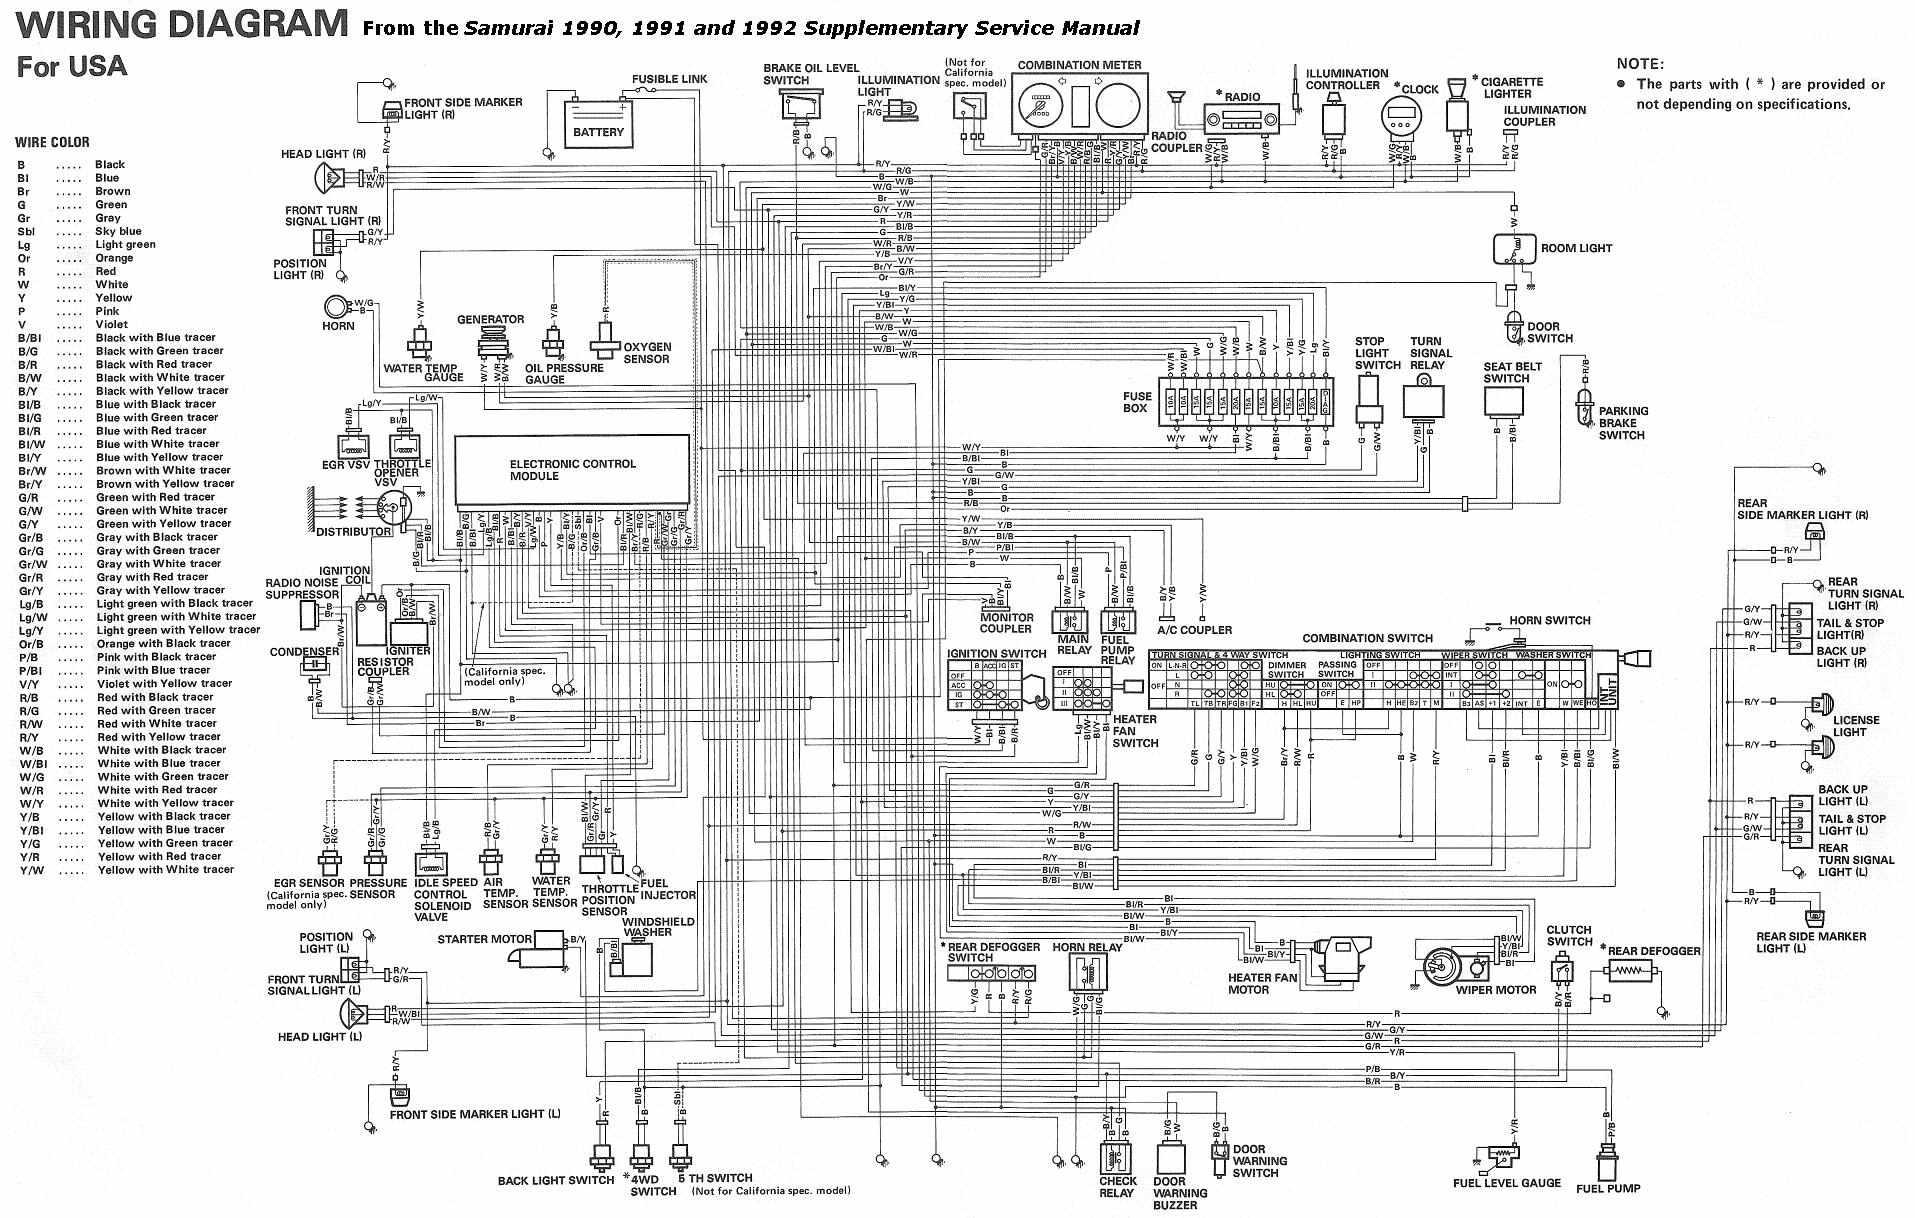 suzuki grand vitara wiring diagram diy wiring diagrams u2022 rh dancesalsa co 2002 Suzuki Grand Vitara 2001 Suzuki Grand Vitara